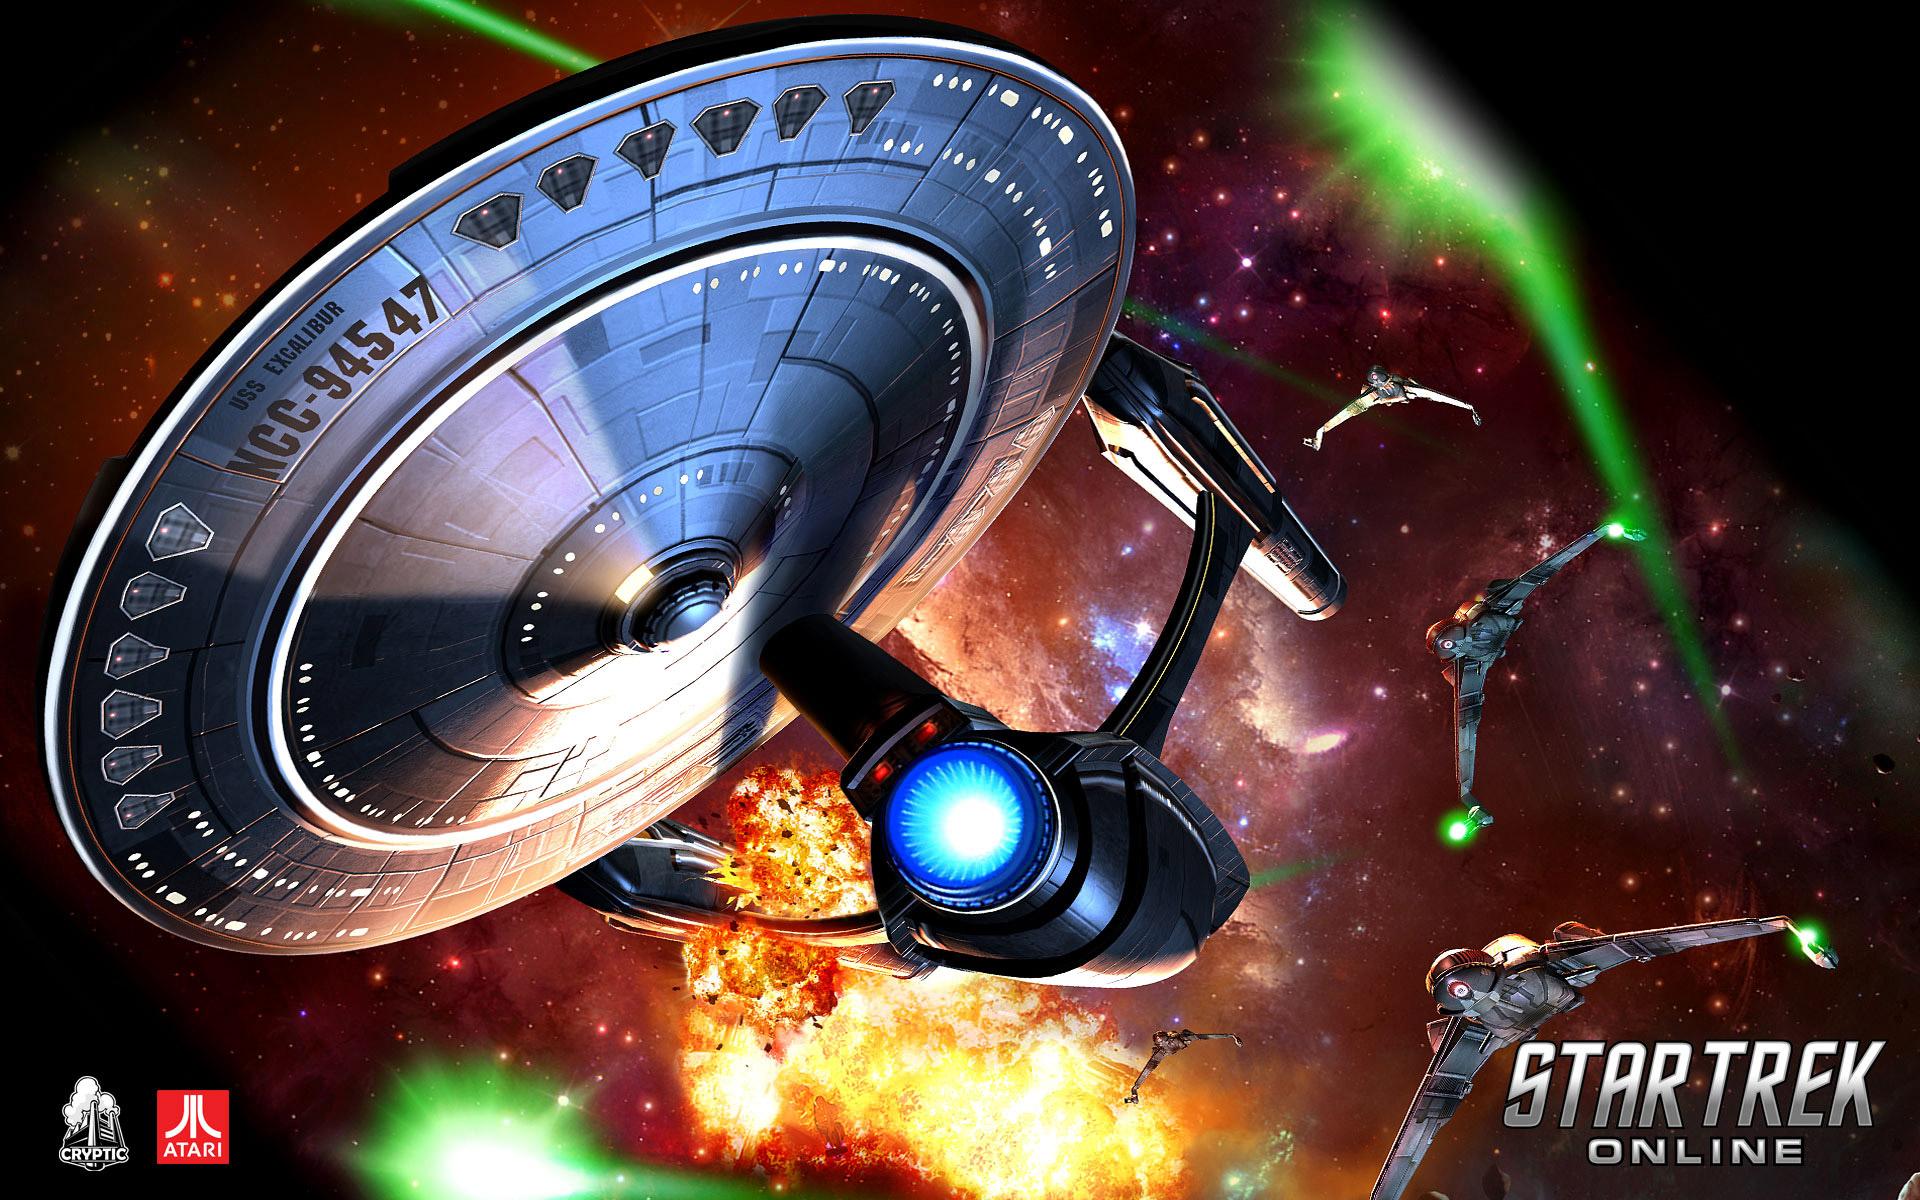 Star Trek Online Wallpaper 1920x1200